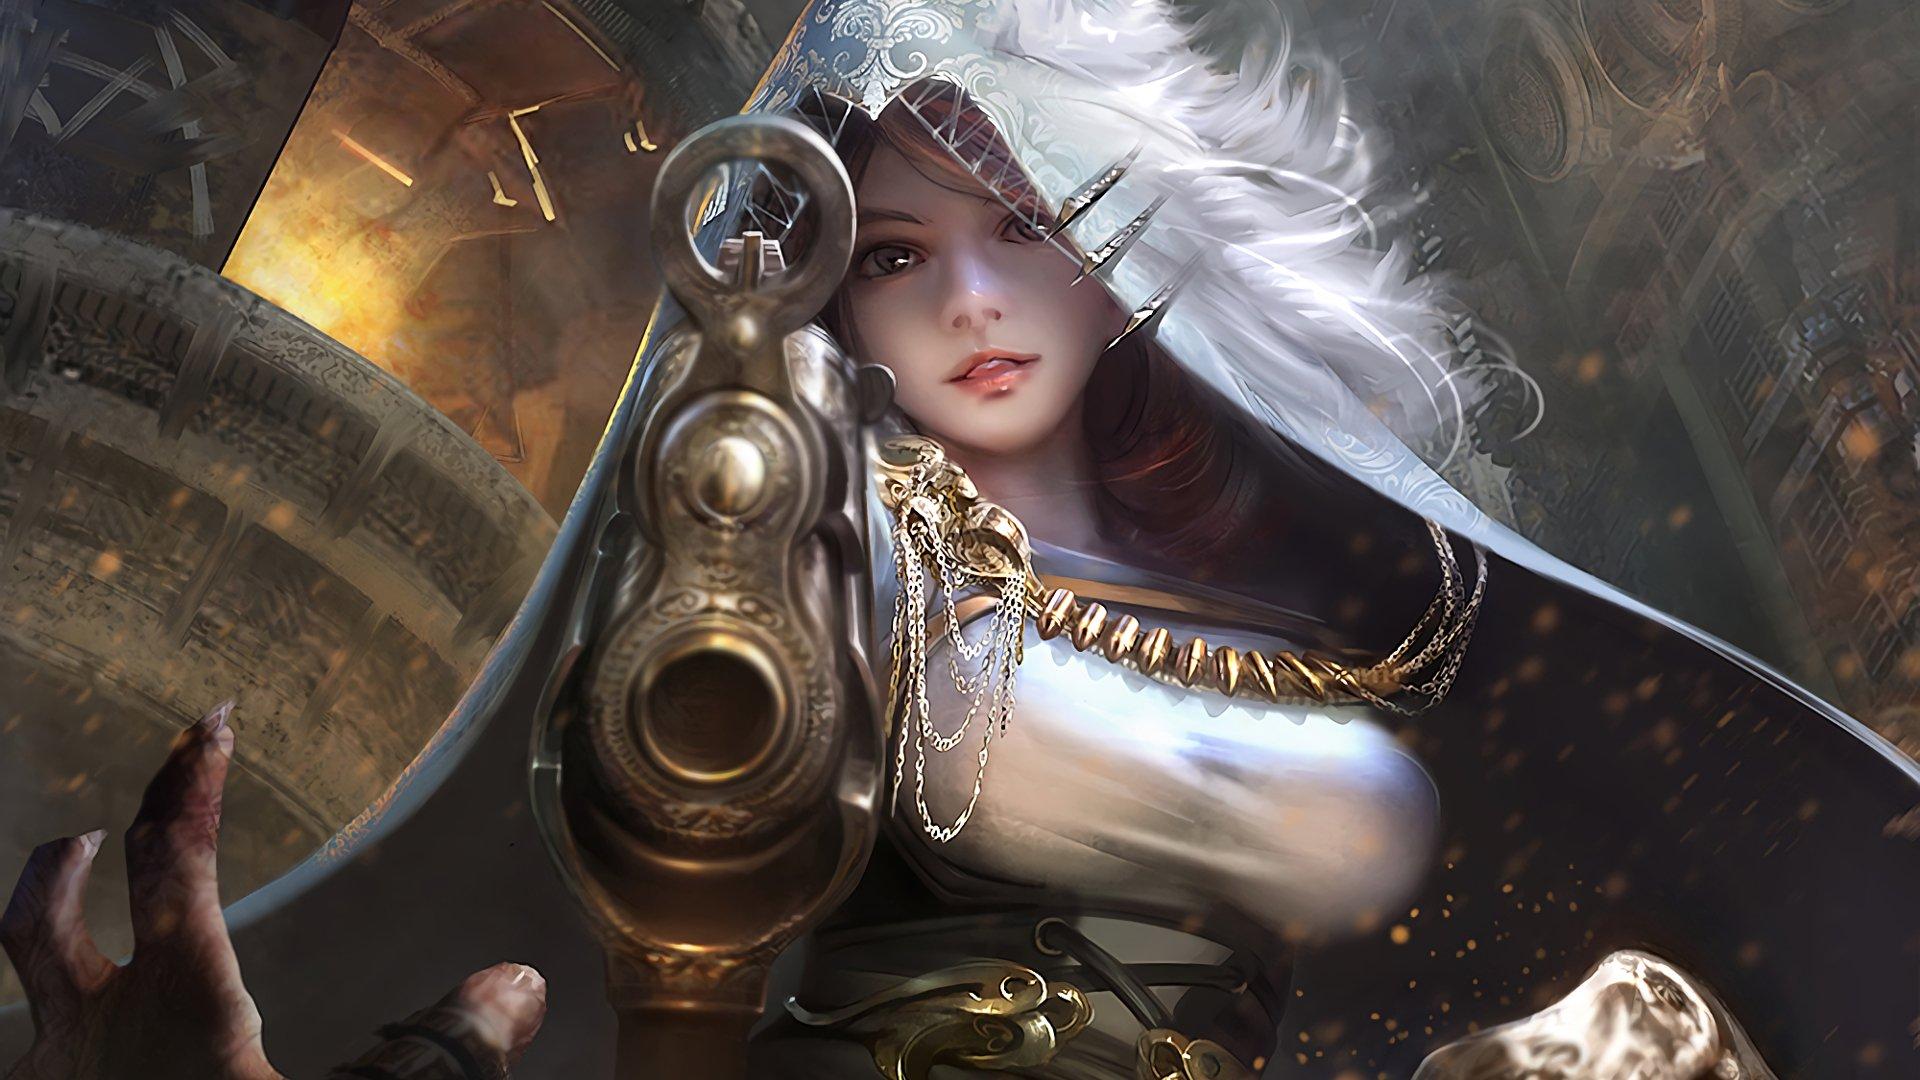 Goth Girl Wallpaper 1440x2960 Women Warrior Hd Wallpaper Background Image 1920x1080